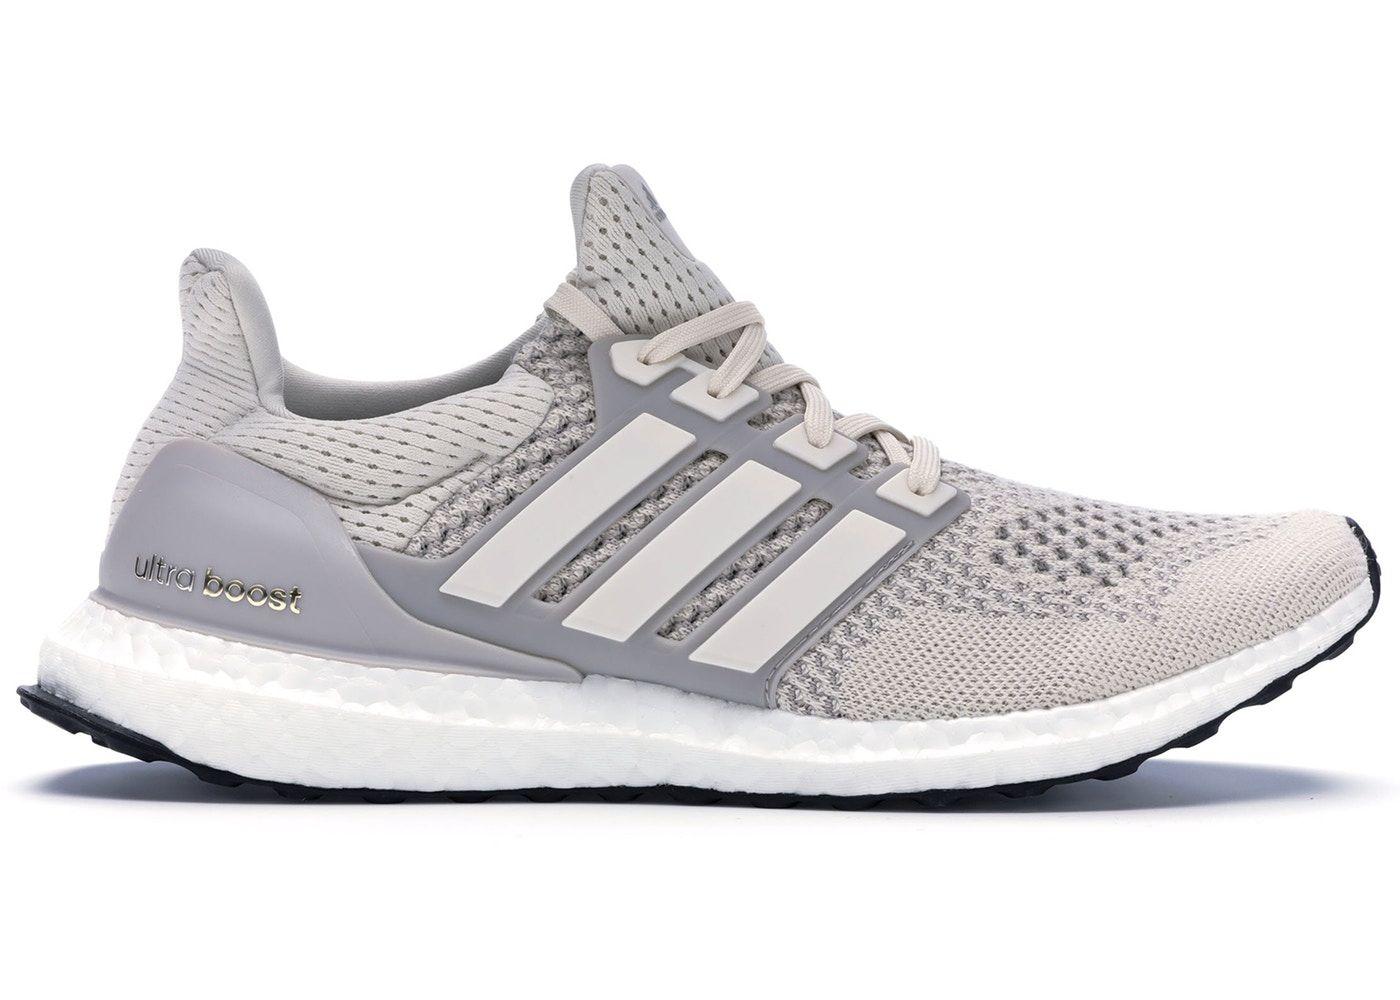 2745963a adidas Ultra Boost 1.0 Cream White in 2019 | Shoes | Adidas, Adidas ...